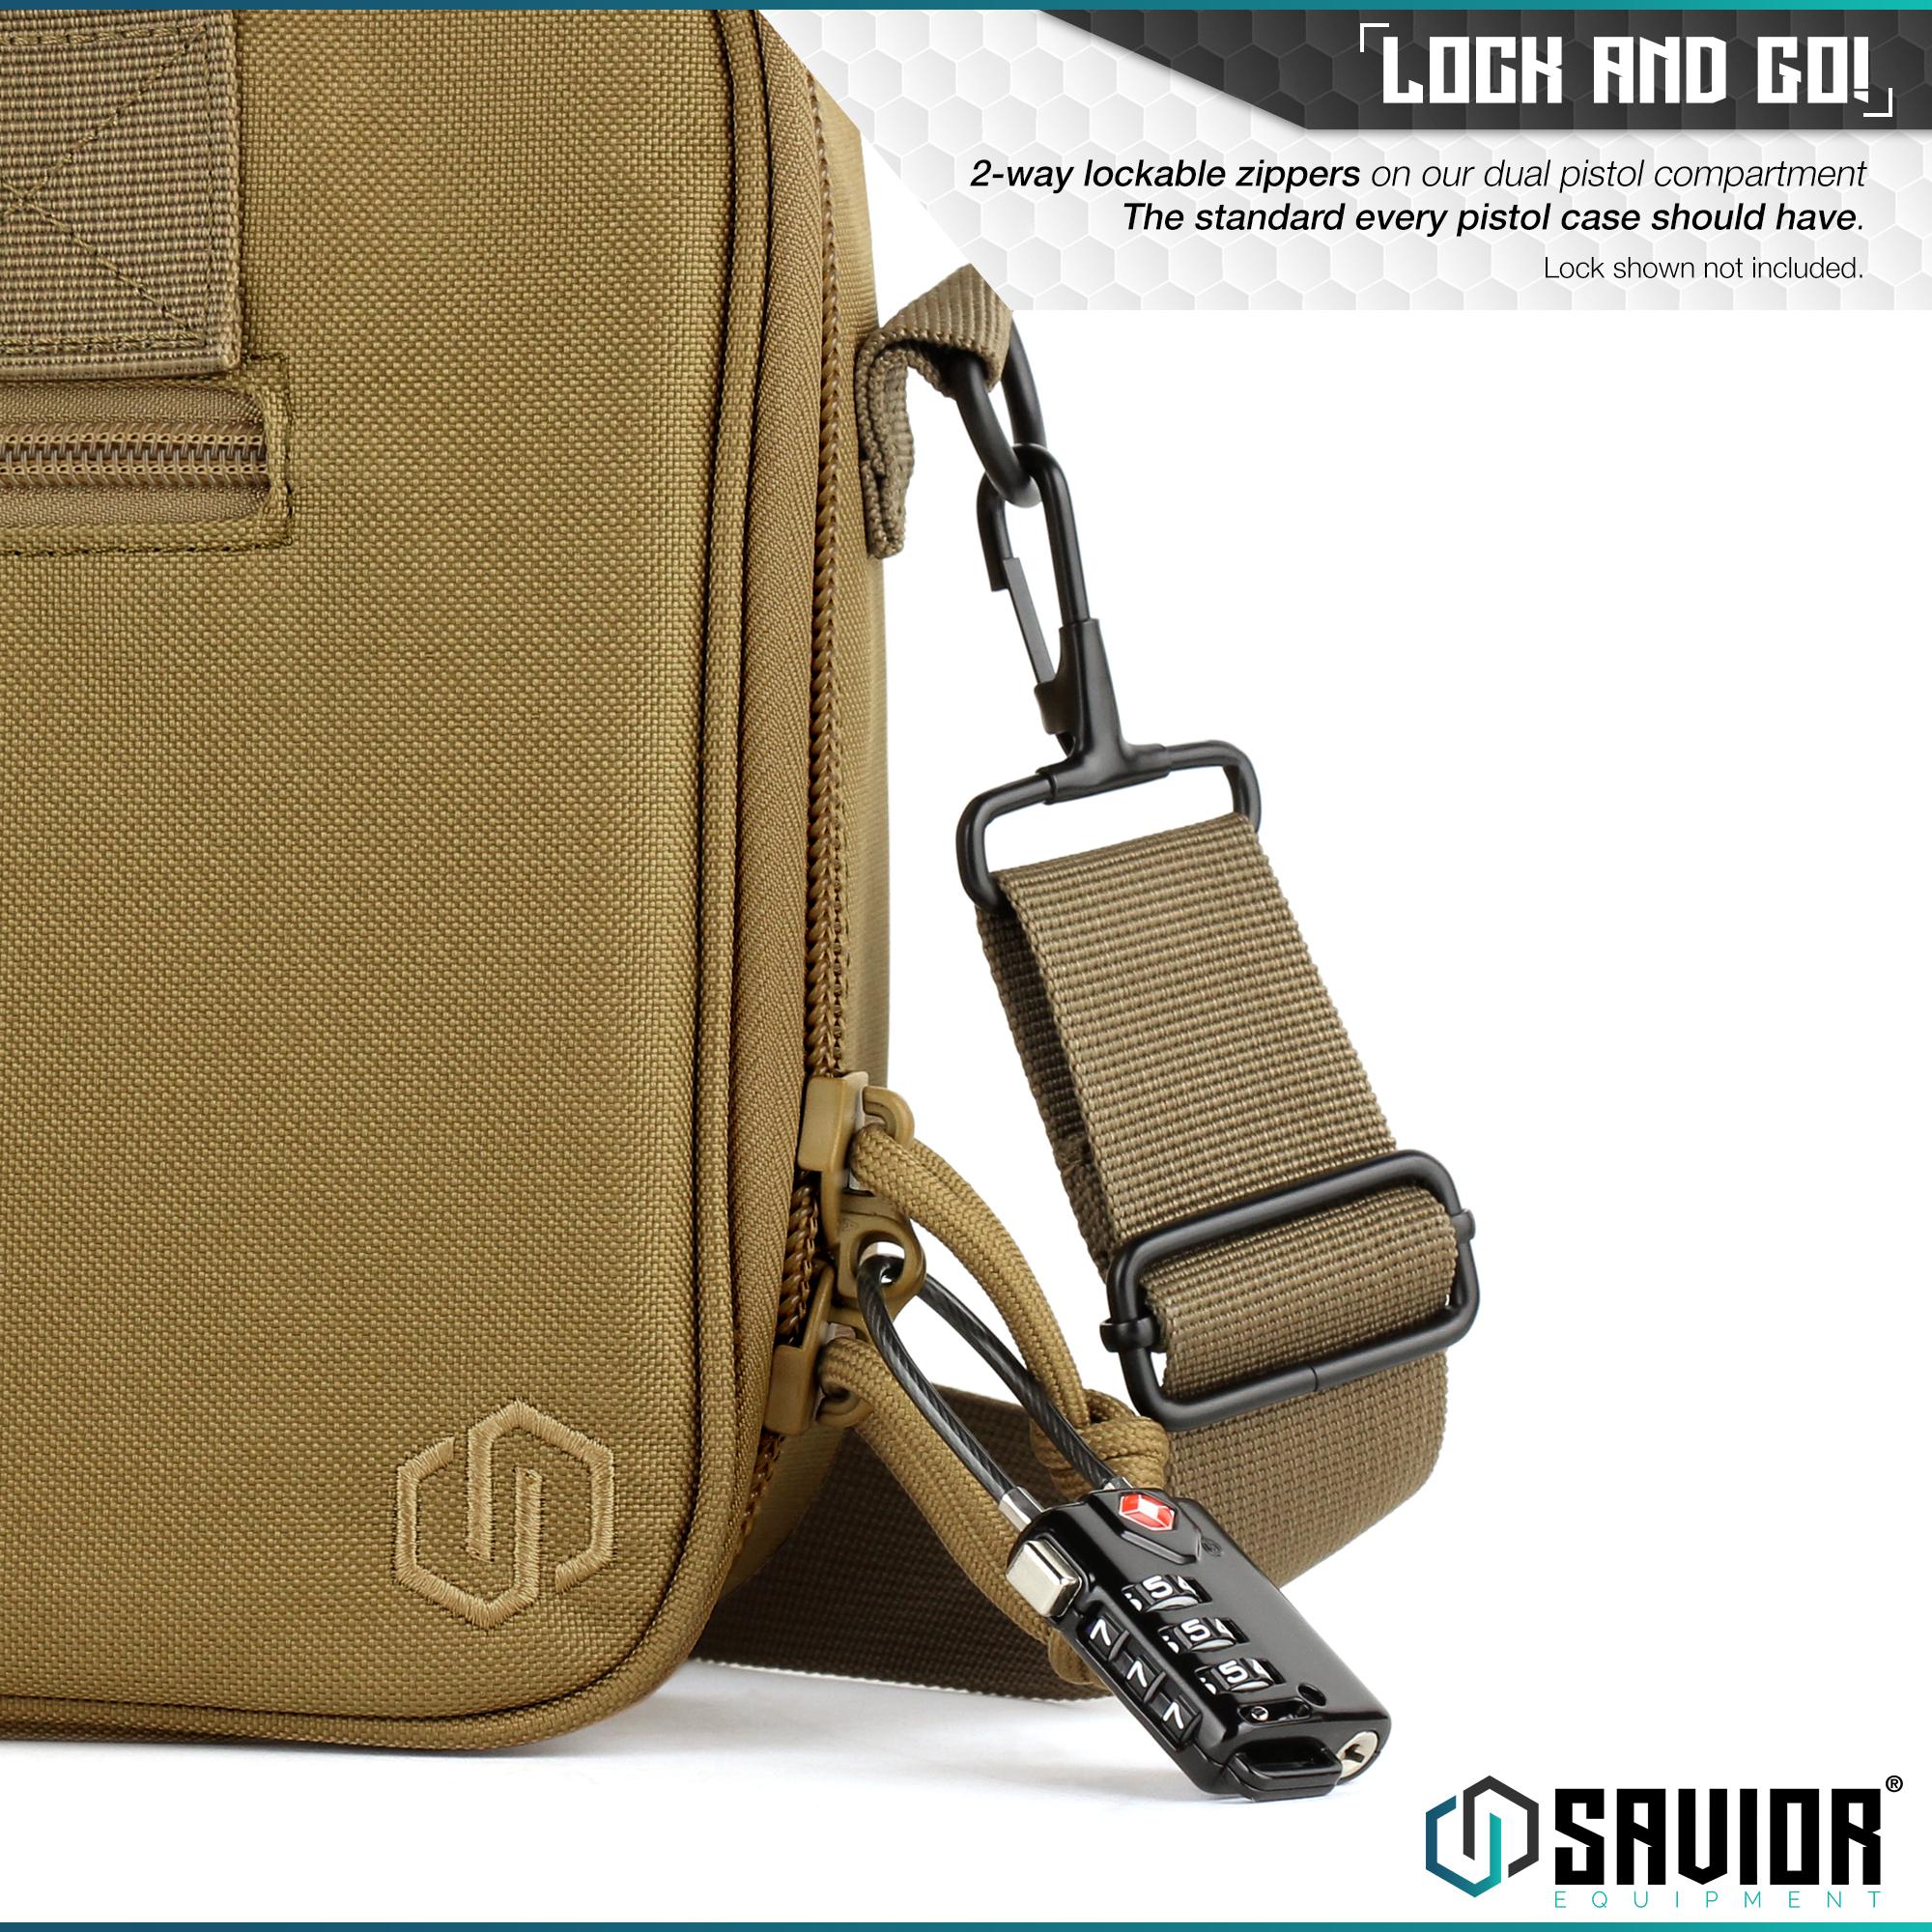 thumbnail 11 - 034-SAVIOR-034-Padded-Discreet-Double-Handgun-Bag-Pistol-Storage-Case-w-Mag-Pouch-Slot